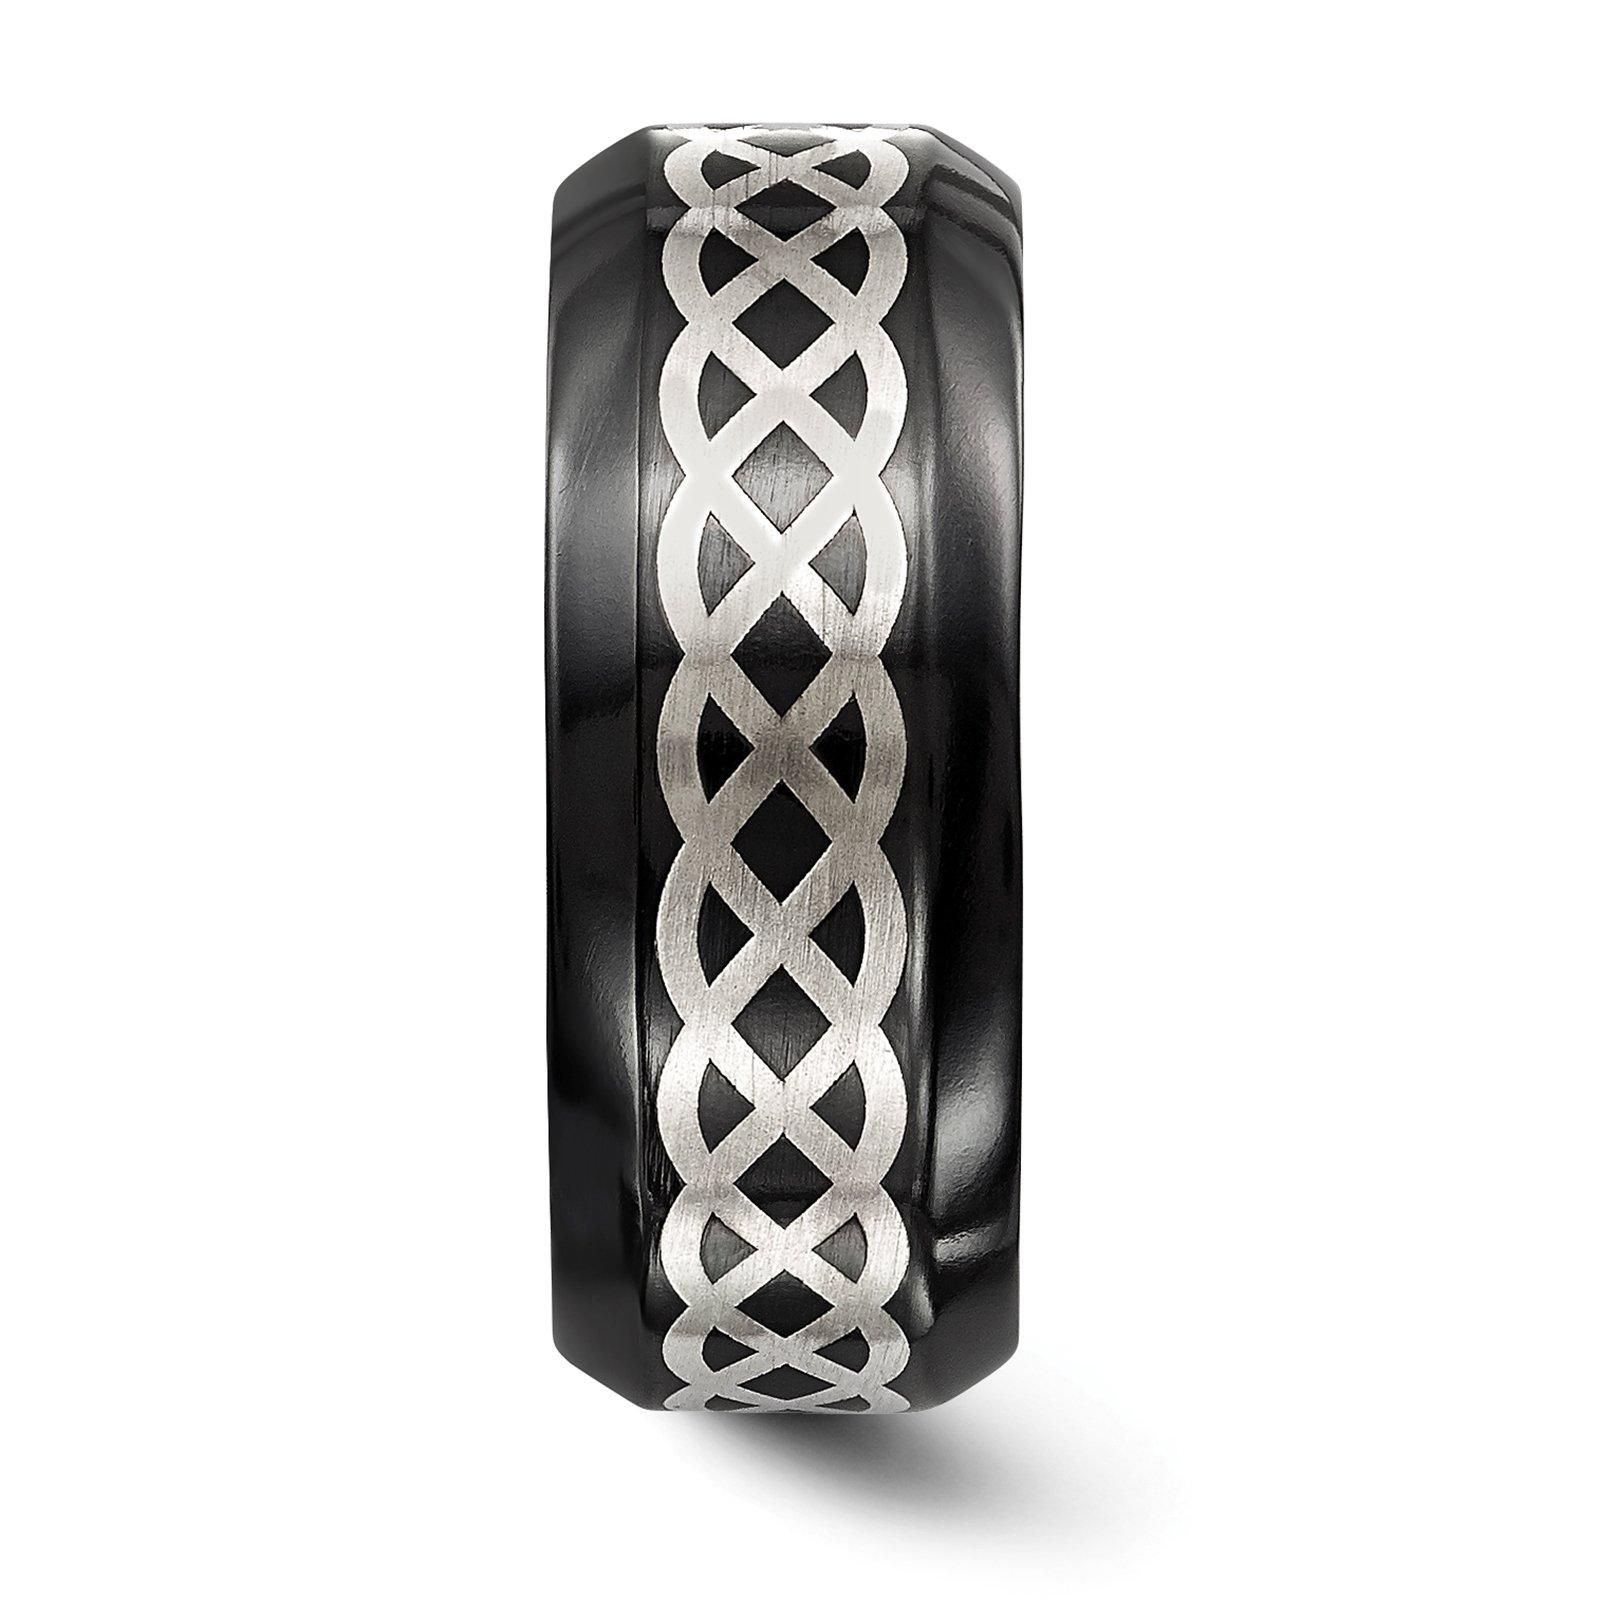 Titanium Black Ti w/Sterling Silver Inlay Celtic Design 9mm Wedding Band Size 10.5 by Edward Mirell by Venture Edward Mirell Titanium Bands (Image #3)